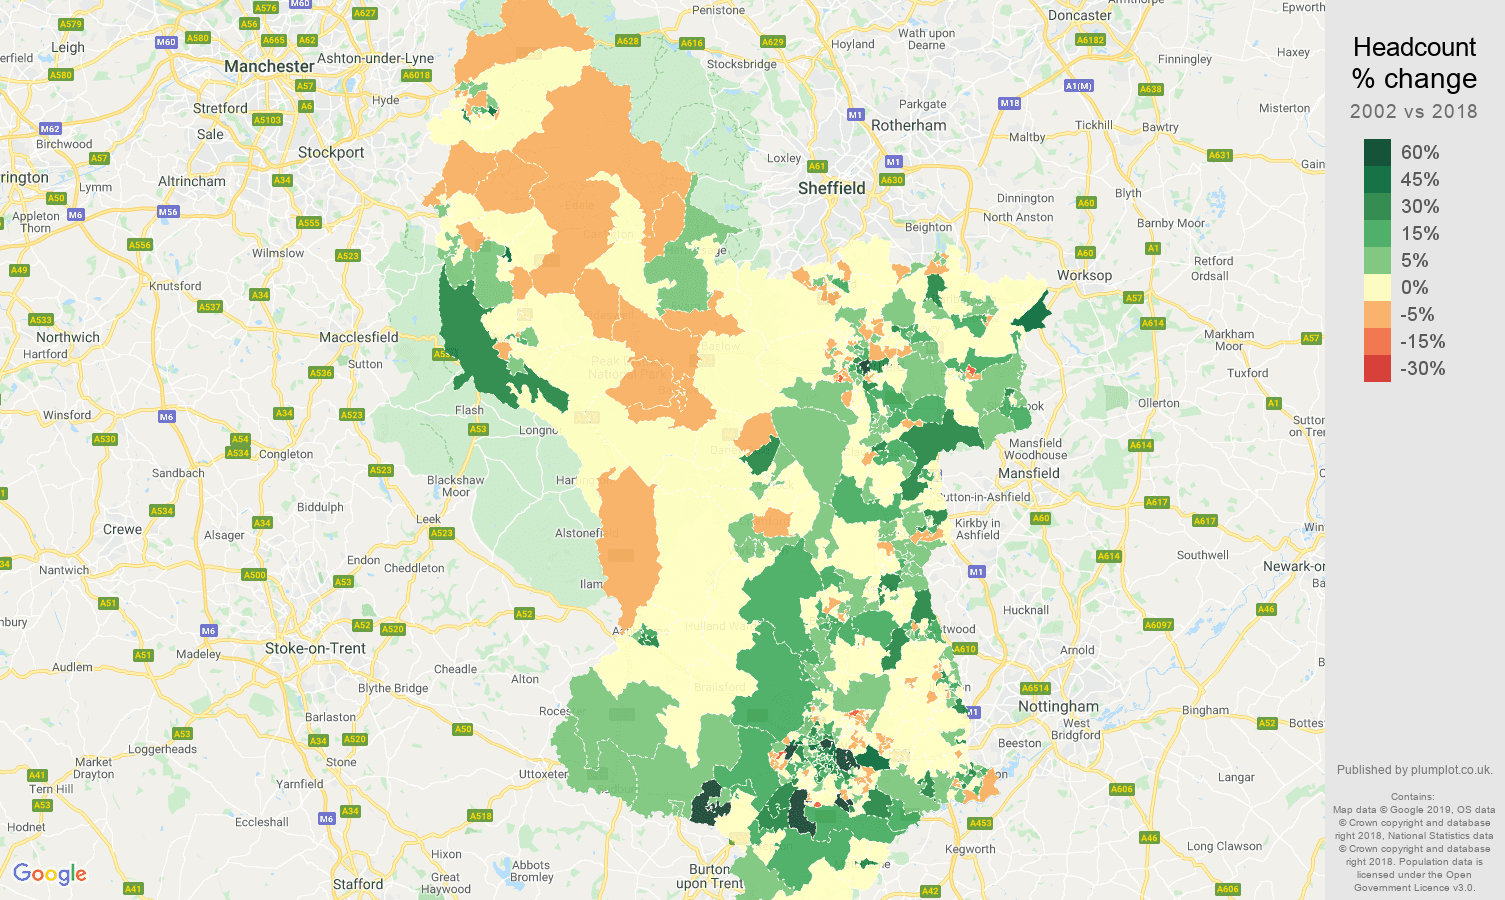 Derbyshire headcount change map